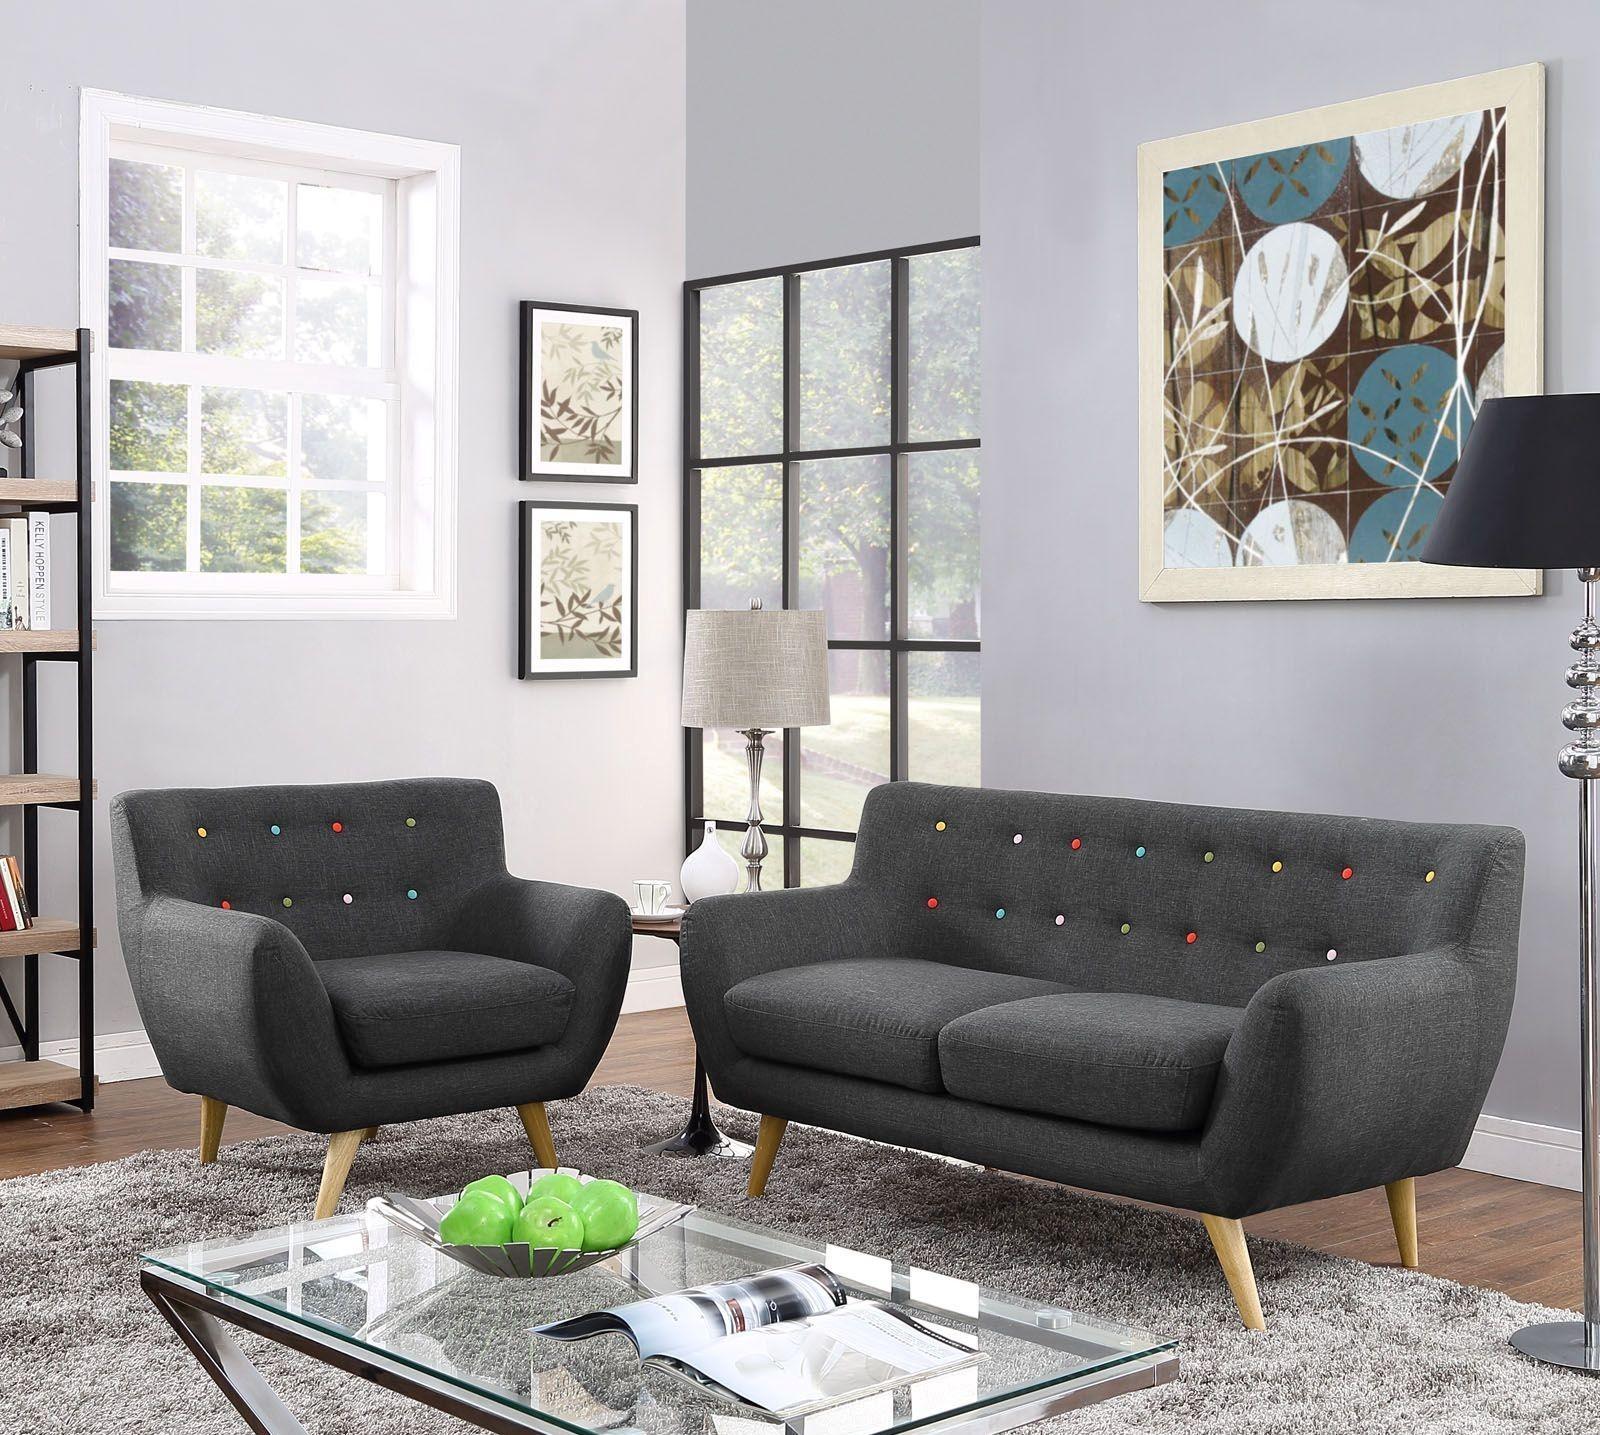 Eei 1783 gry set remark gray 2 piece living room set from for Two piece living room set